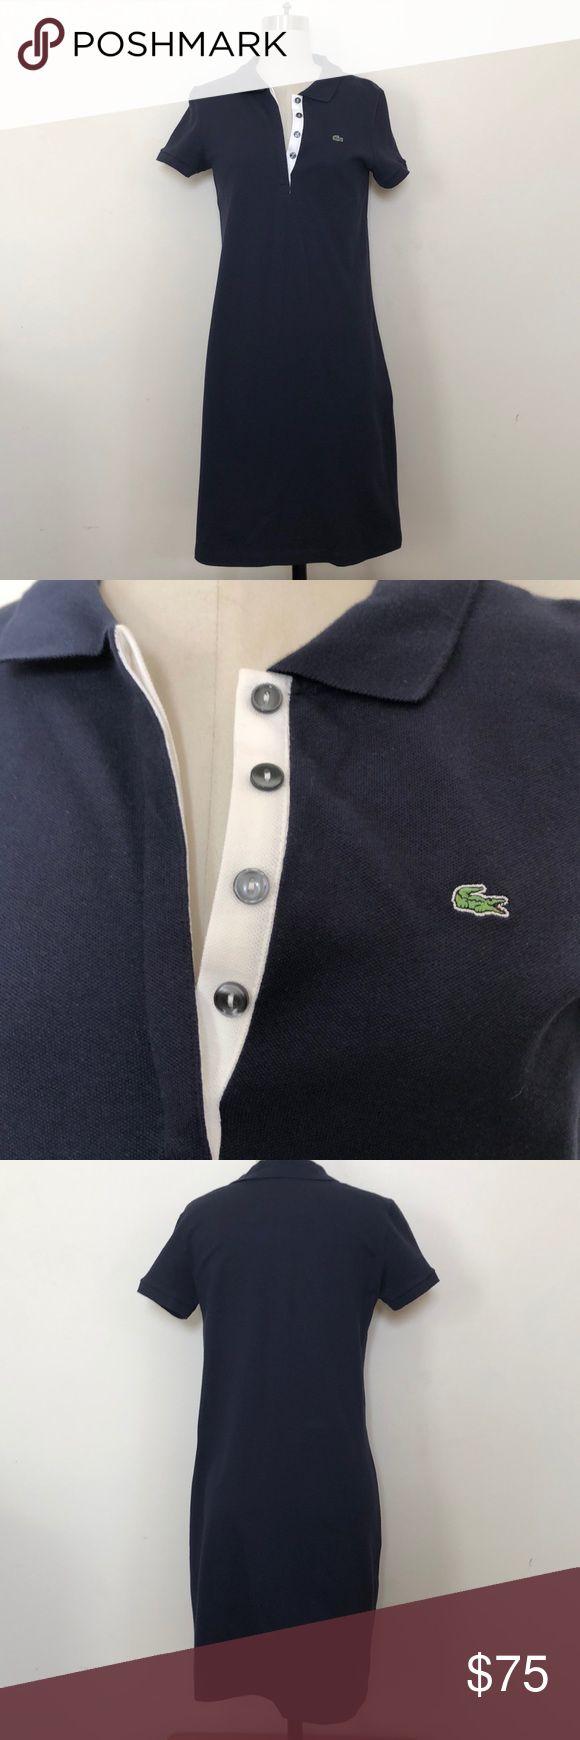 Mer enn 25 bra ideer om crocodile logo p pinterest tennis lacoste pique stretch navy polo tennis dress buycottarizona